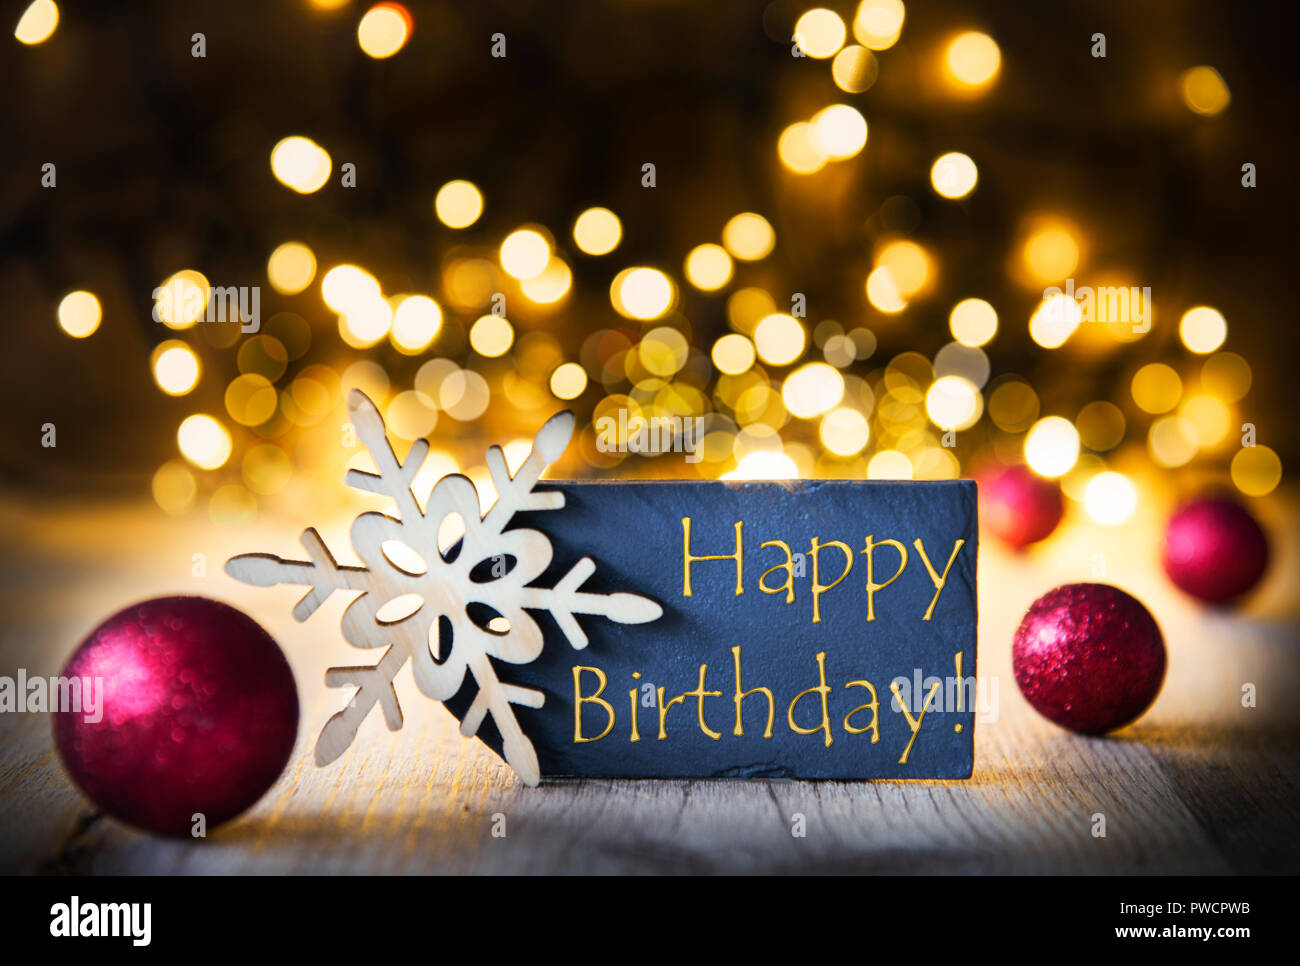 Christmas Background Sparkling Lights Text Happy Birthday Stock Photo Alamy